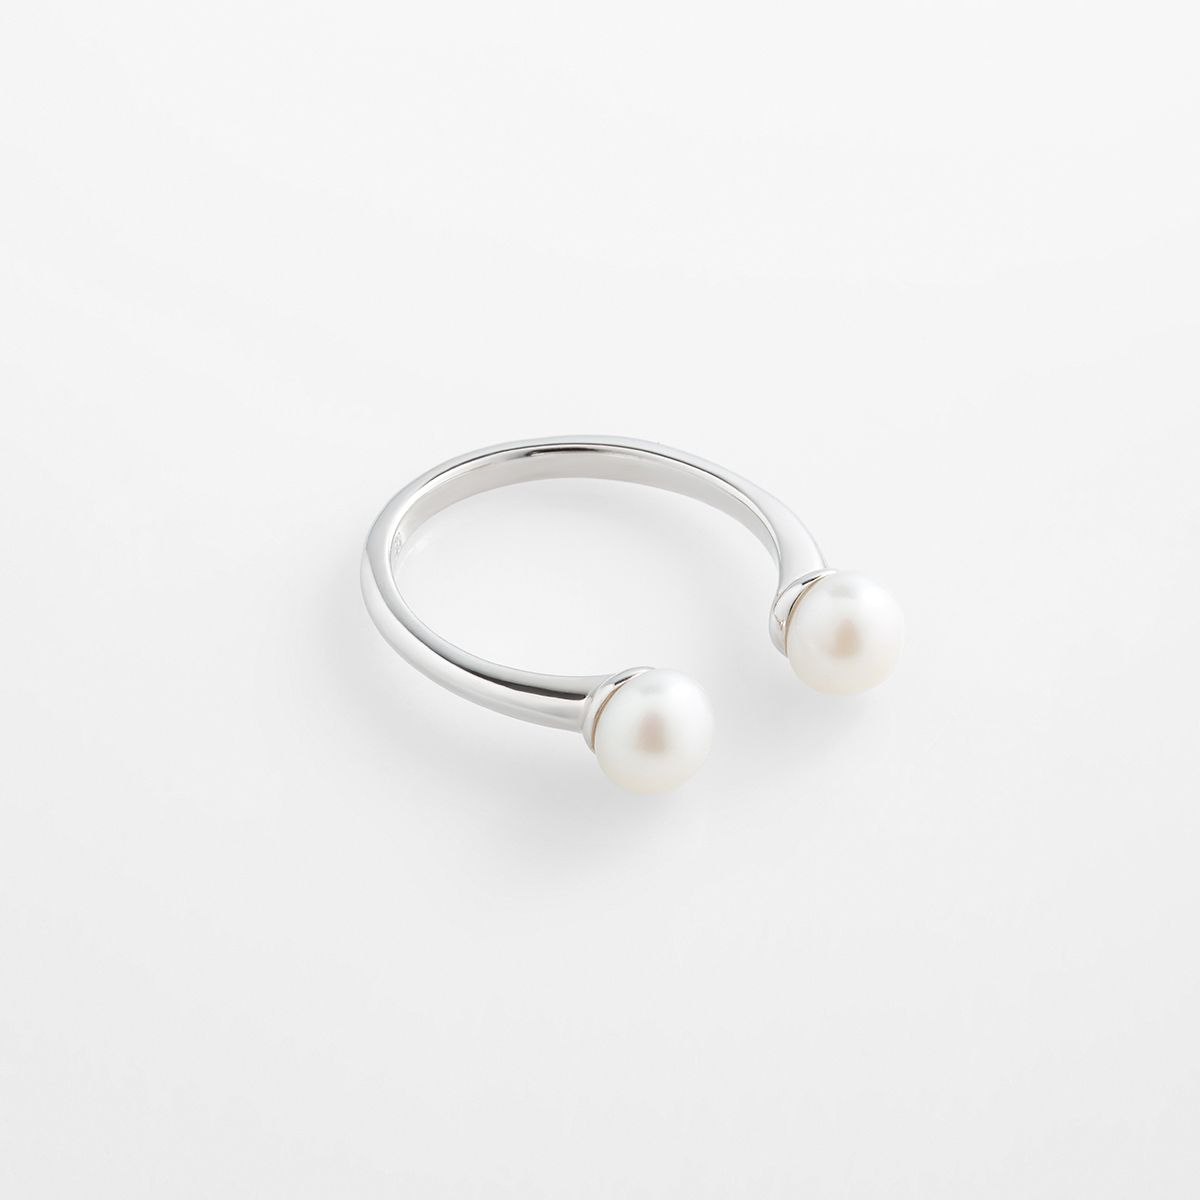 Alva - Perlenring - Silber